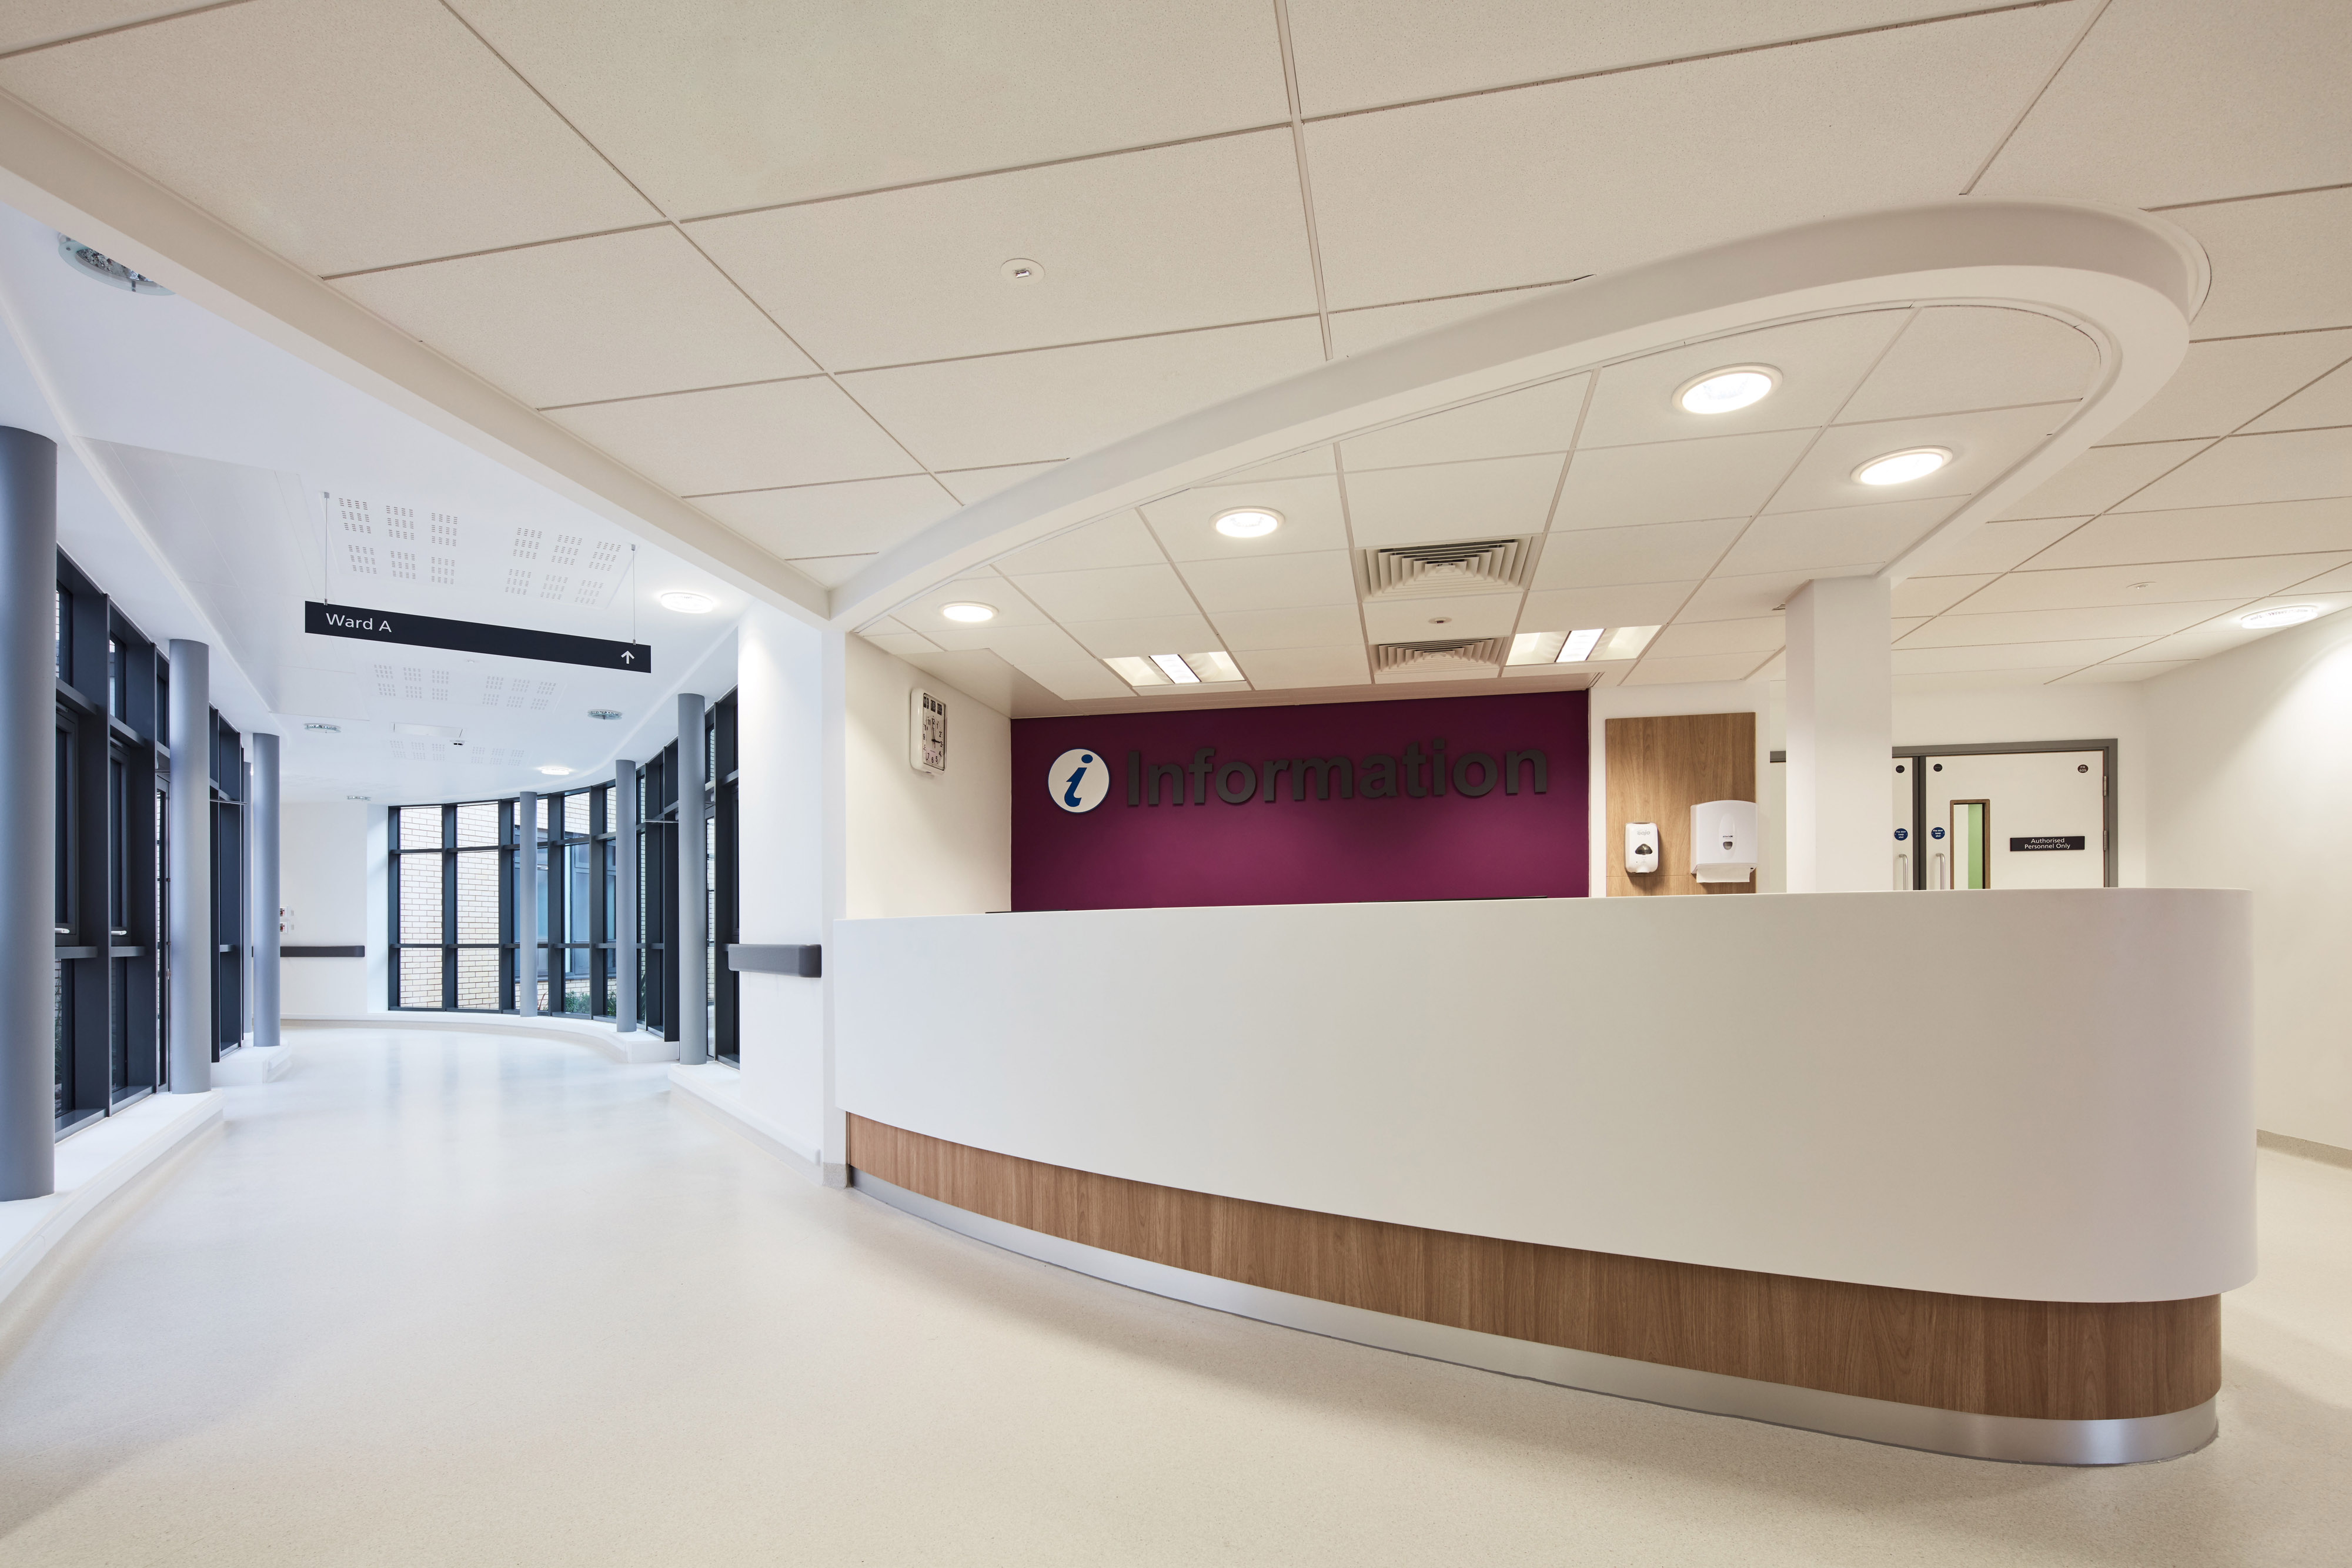 Wrightington Hospital 8937